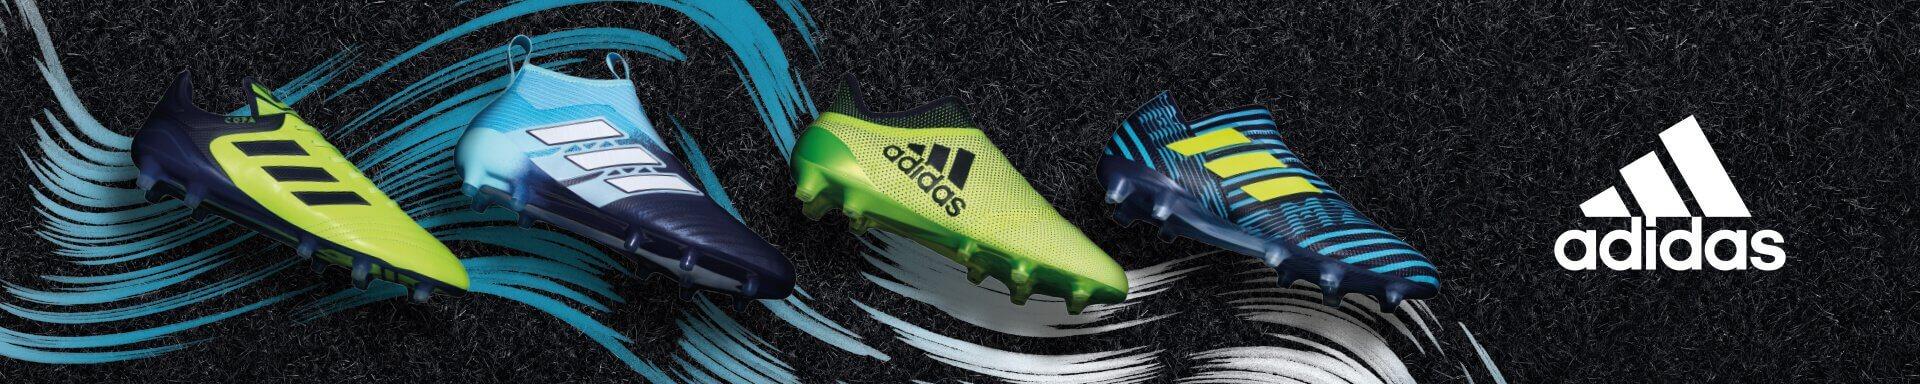 Adidas brede voetbalschoenen